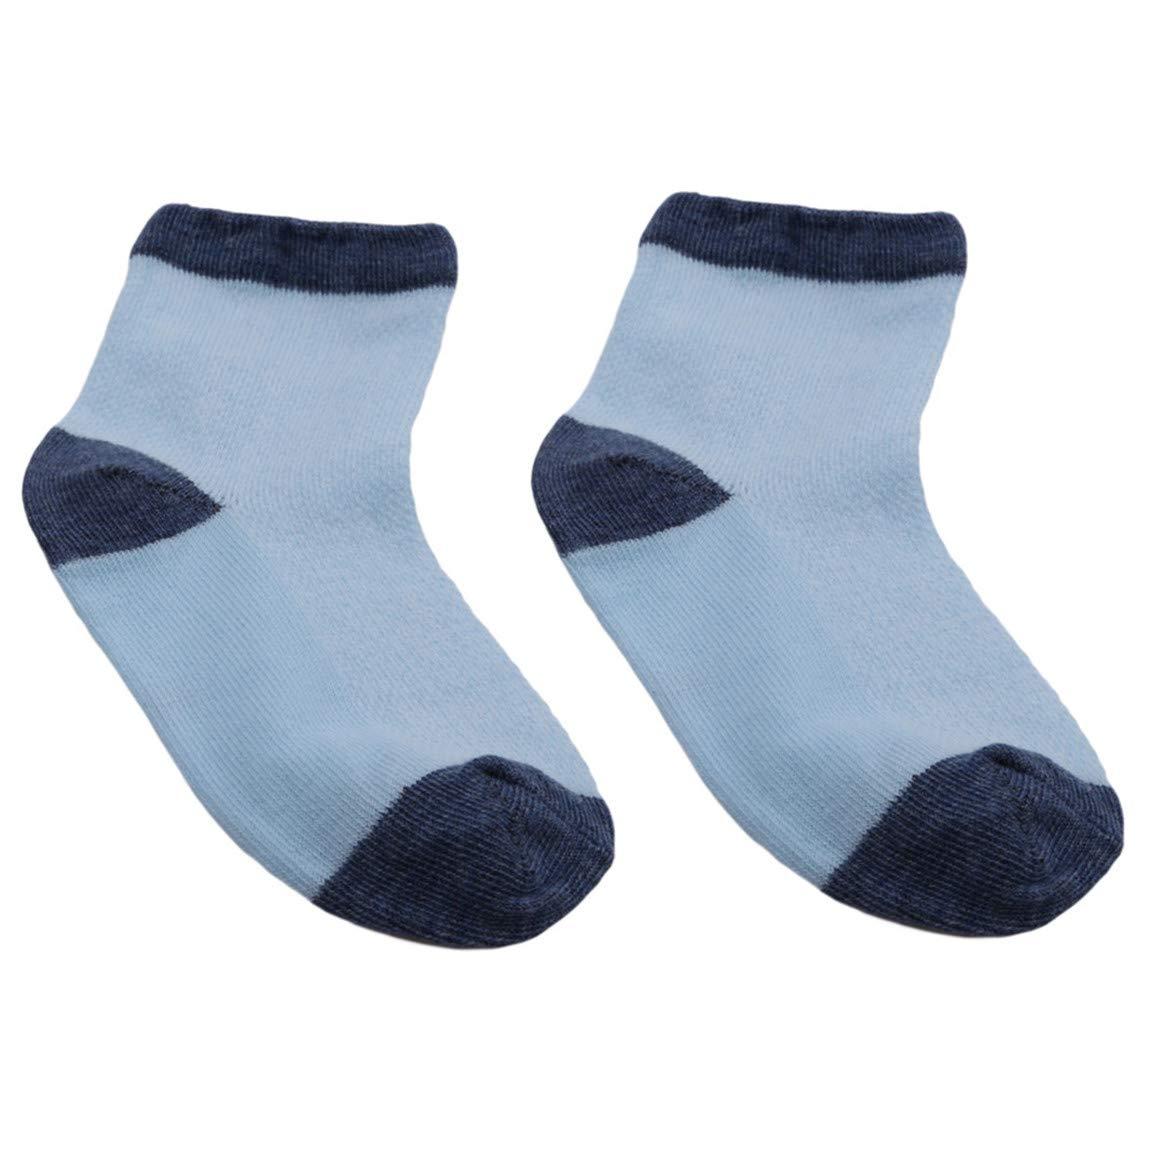 Blue Dog L CH Baby Summer Warm Cotton Mesh Thin Socks Cute Cartoon Sweet Animal ShapedSoft Breathable Socks Good For Gift 5pcs